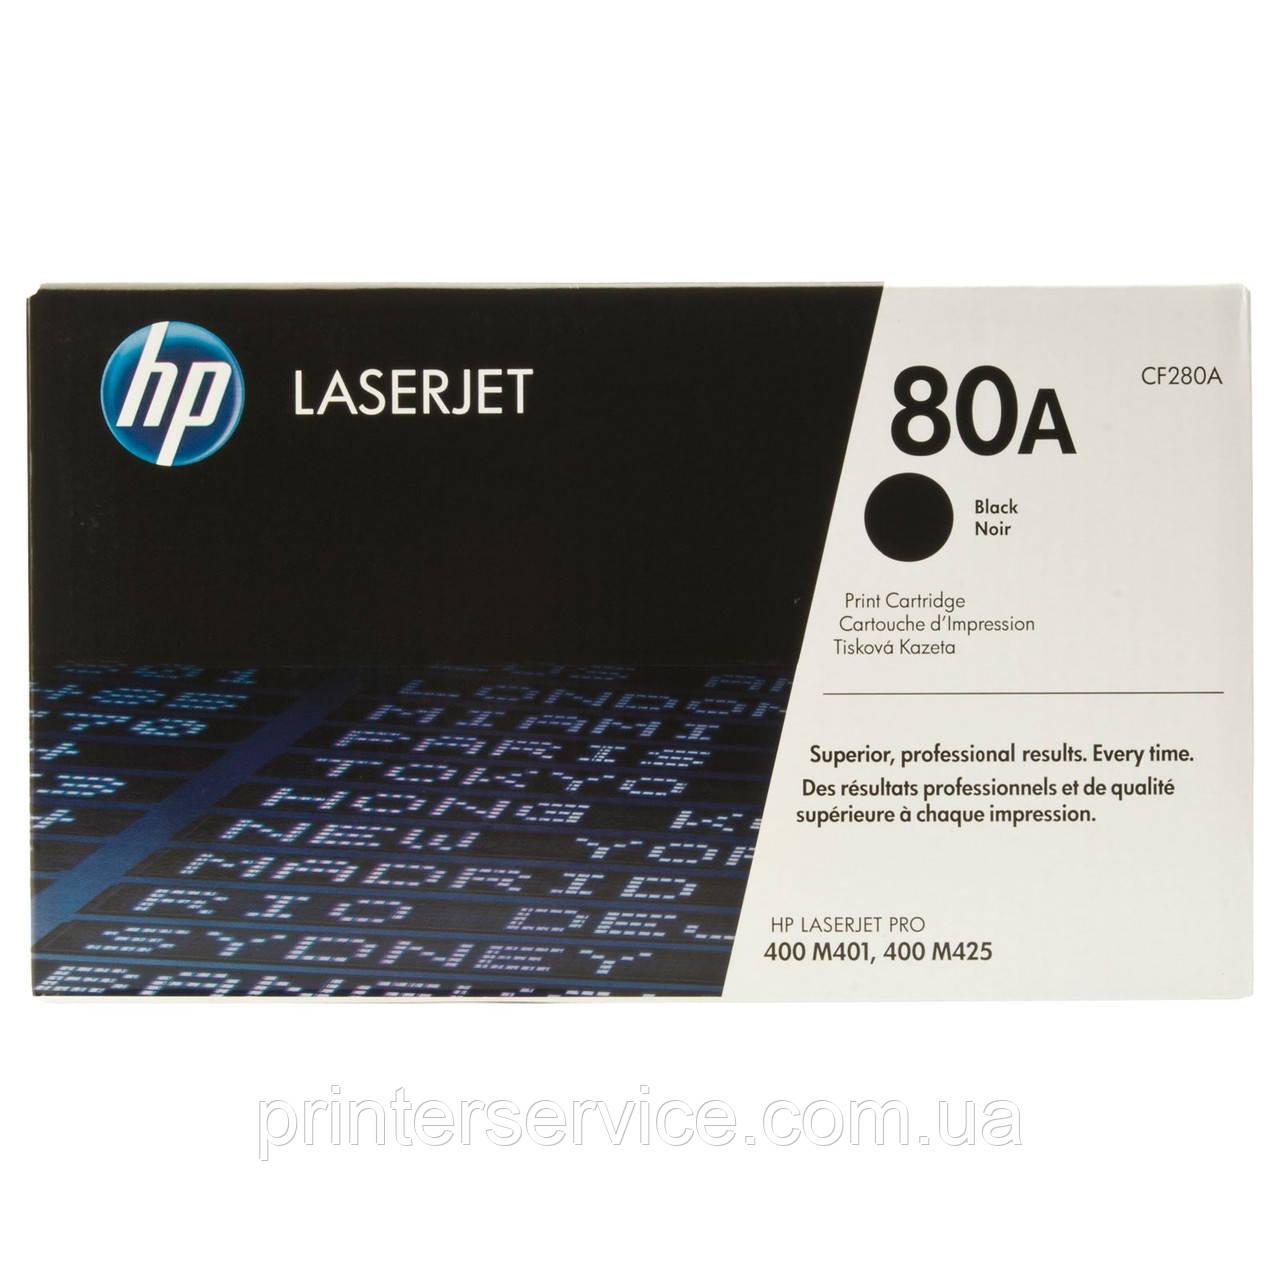 CF280A (80A) картридж для HP M401/M425 series - ООО Триал в Киеве